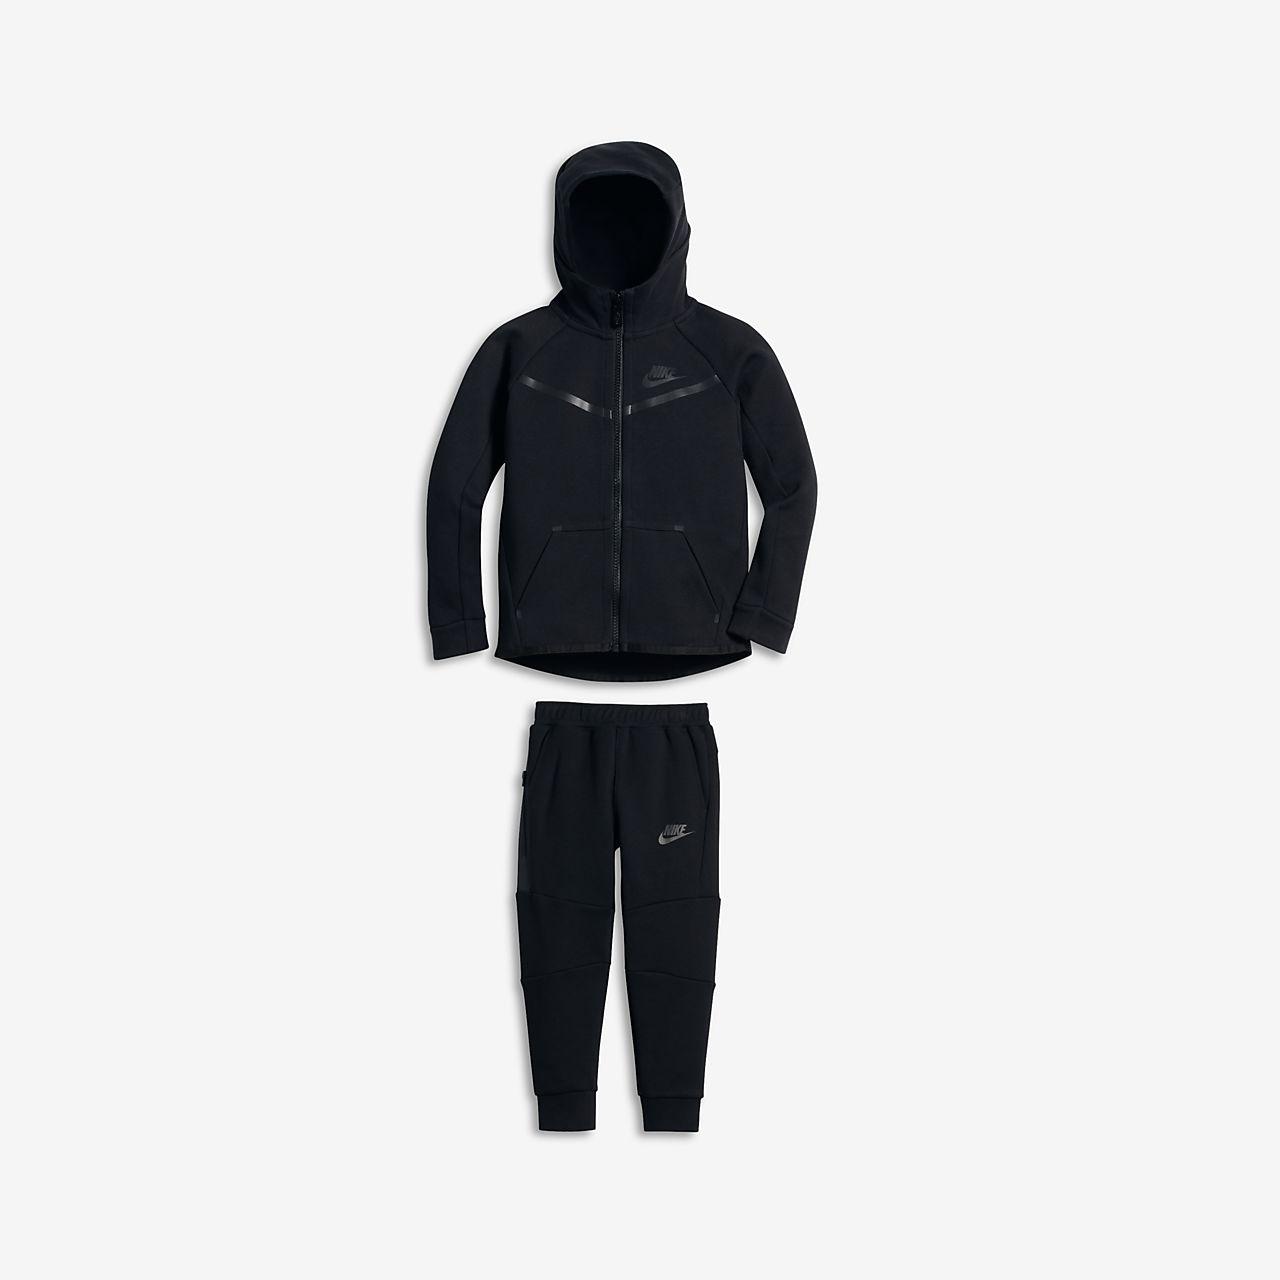 Nike Tech Fleece Toddler 2-Piece Set